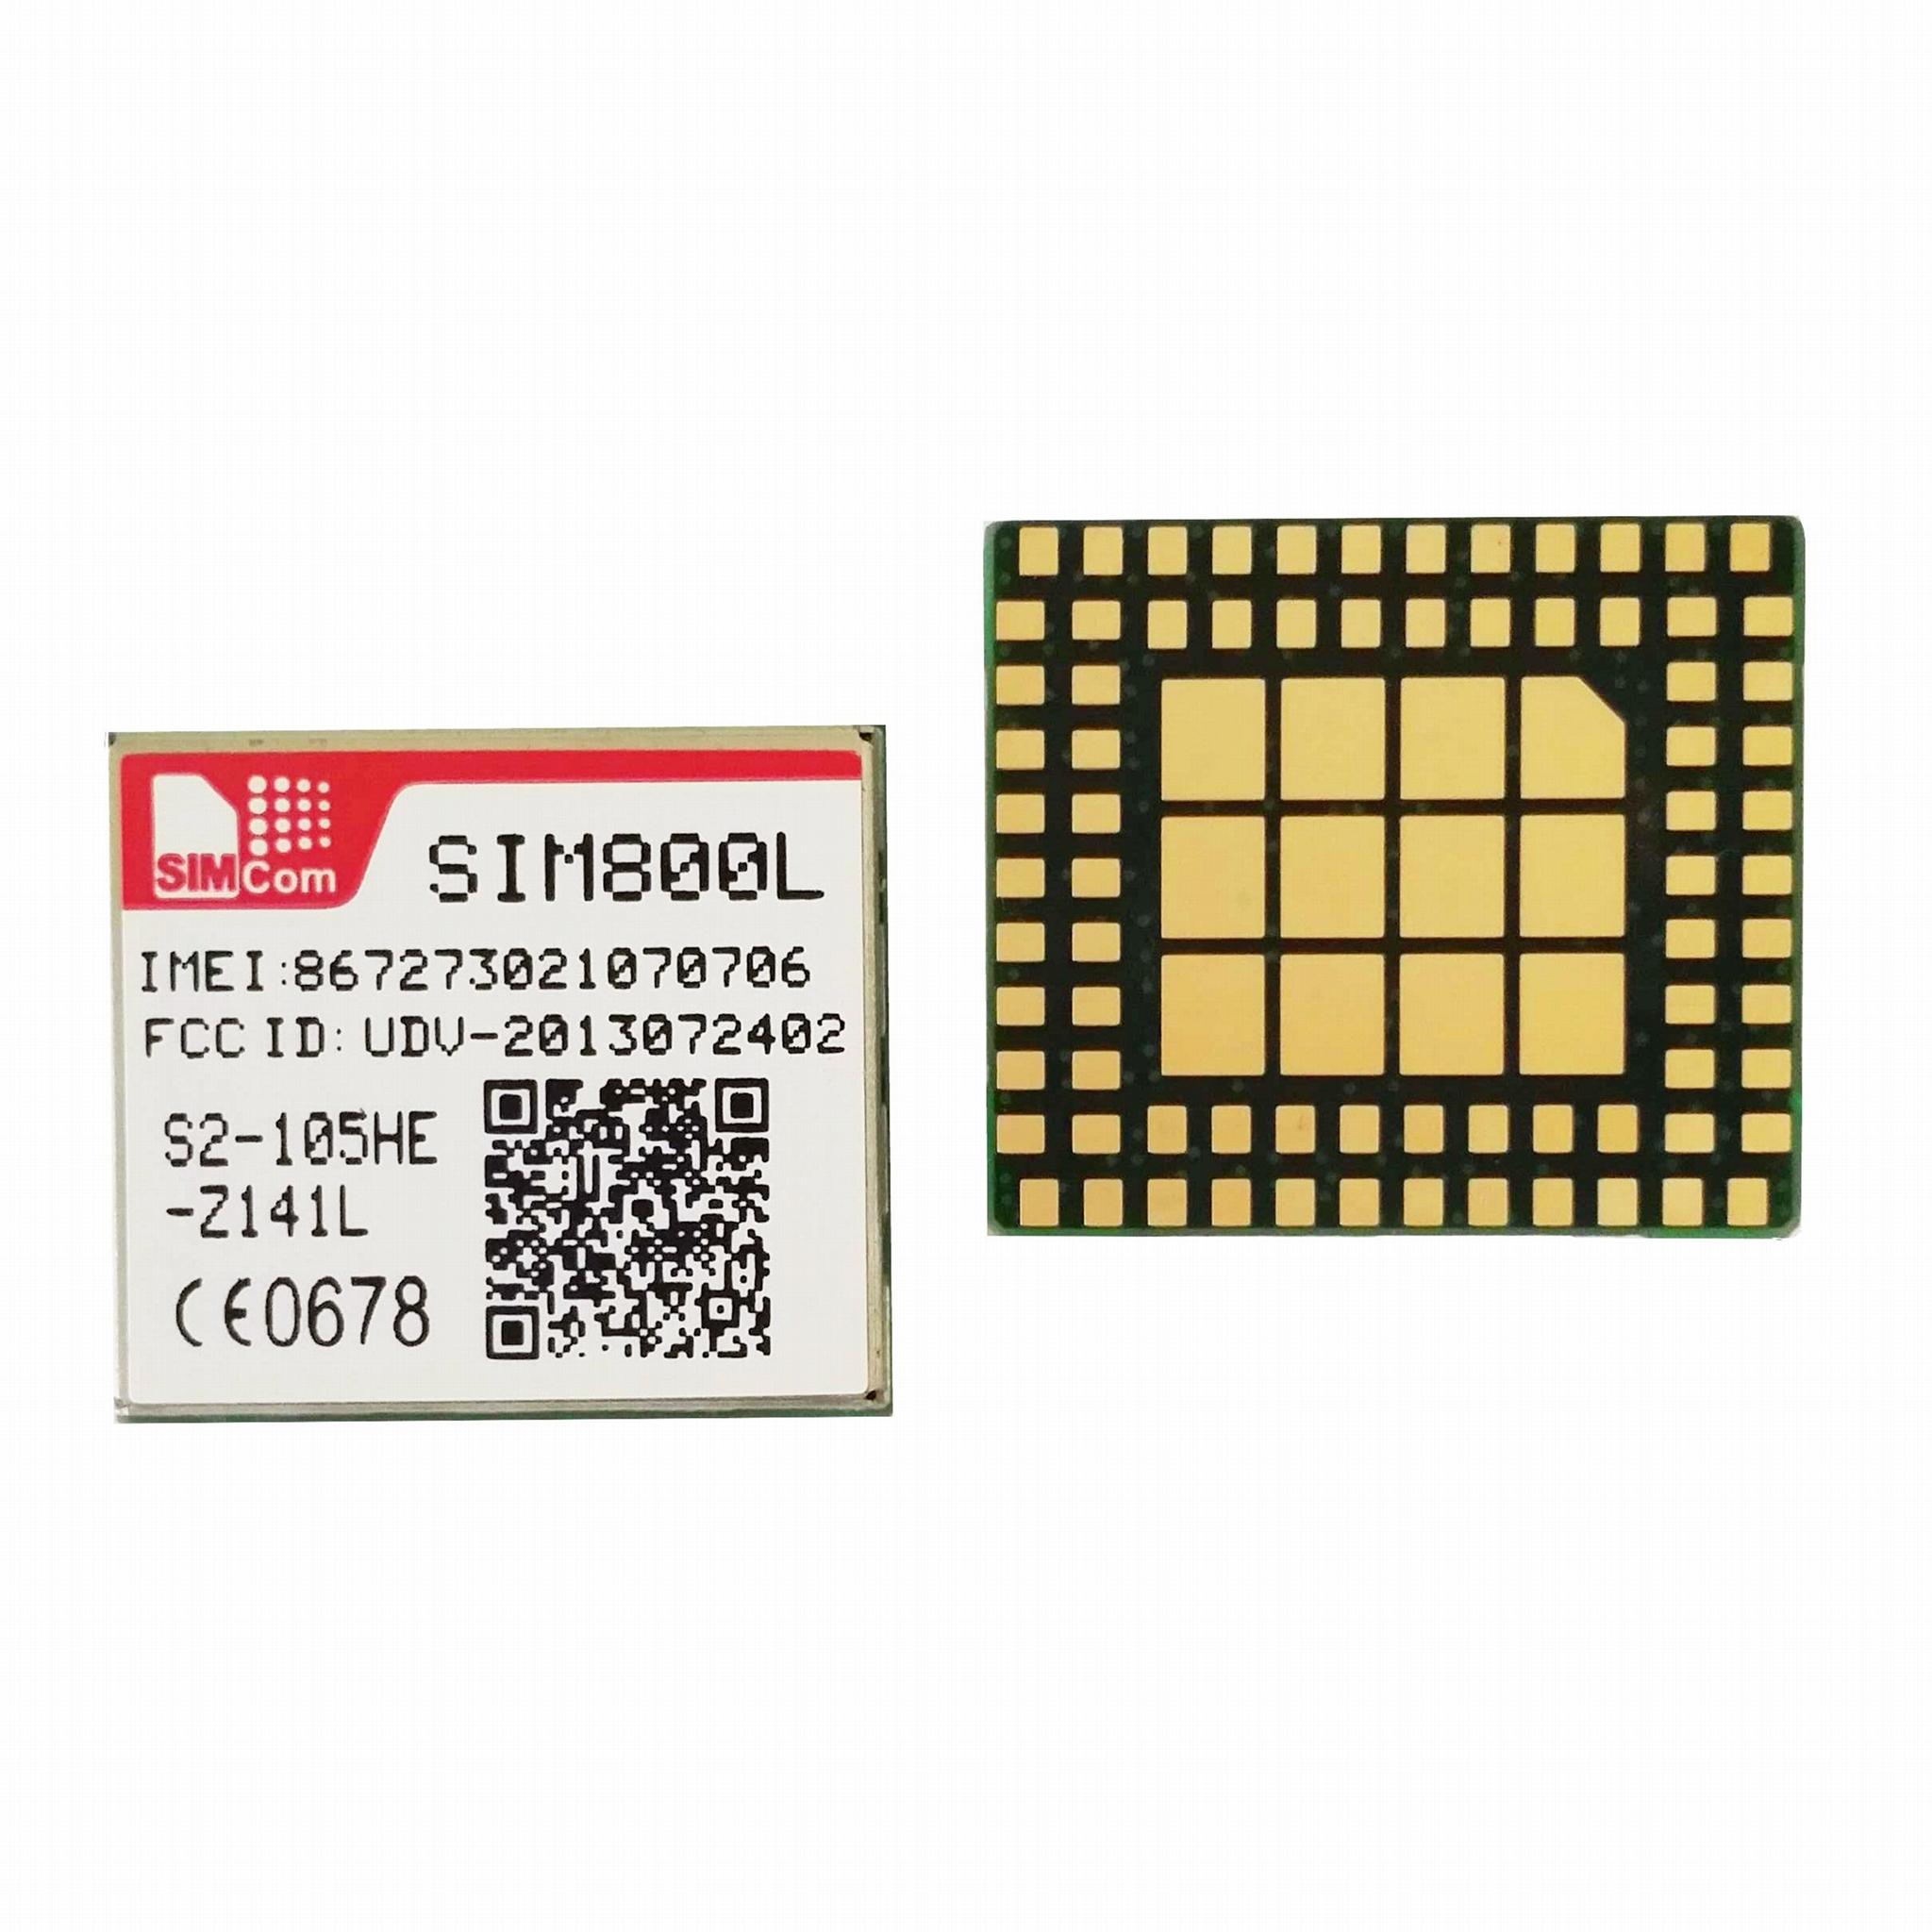 SIMCOM SIM800L 2G GSM GPRS Module, LGA Form Factor Communication Module